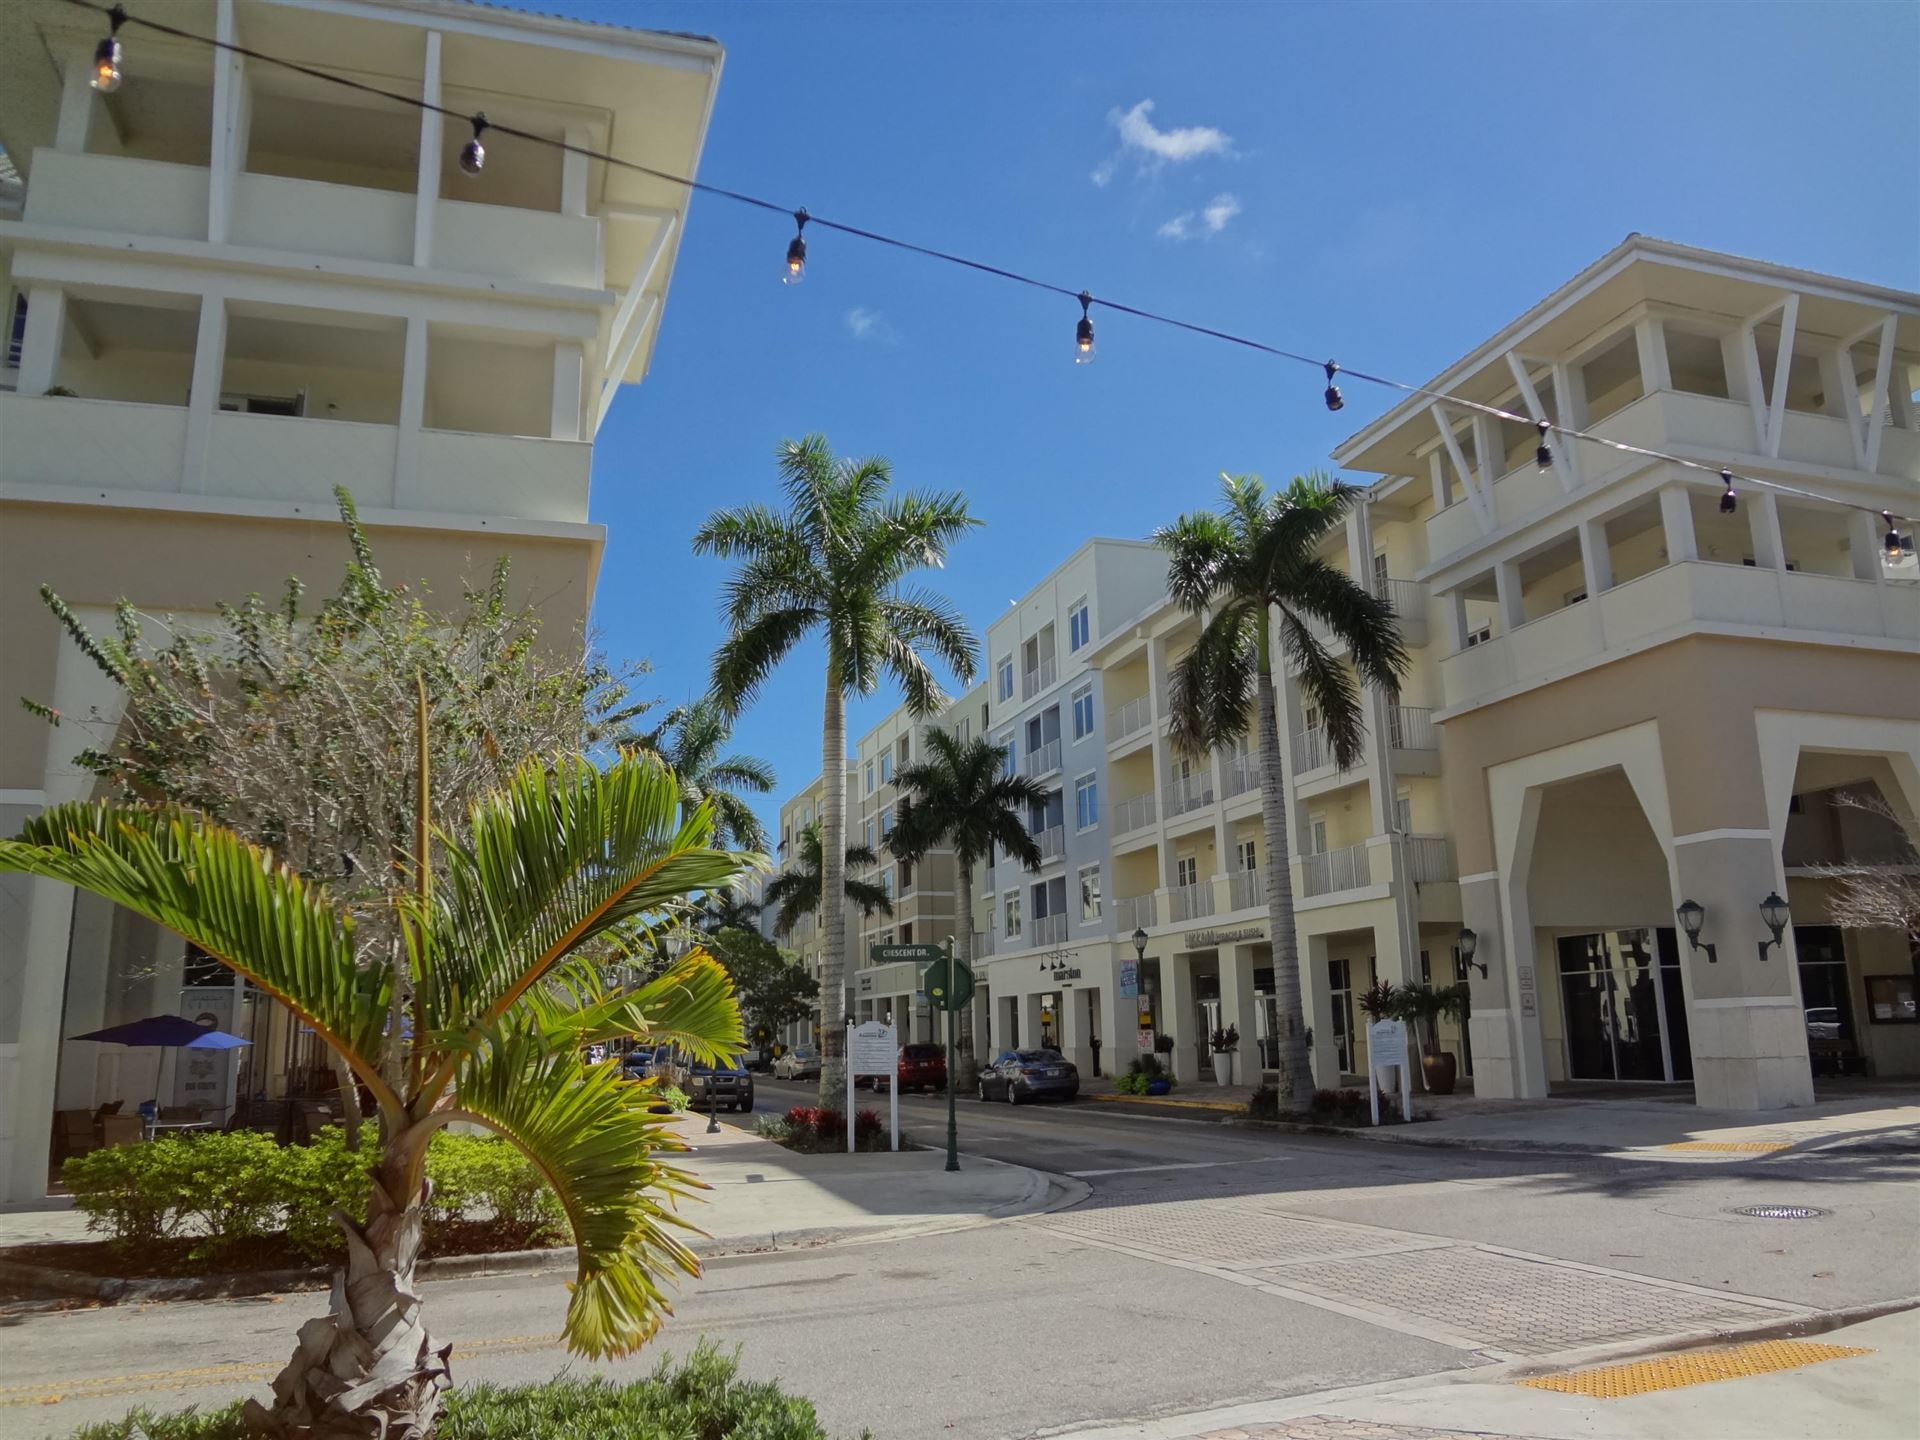 Photo of 1200 Town Center Drive #308, Jupiter, FL 33458 (MLS # RX-10637188)